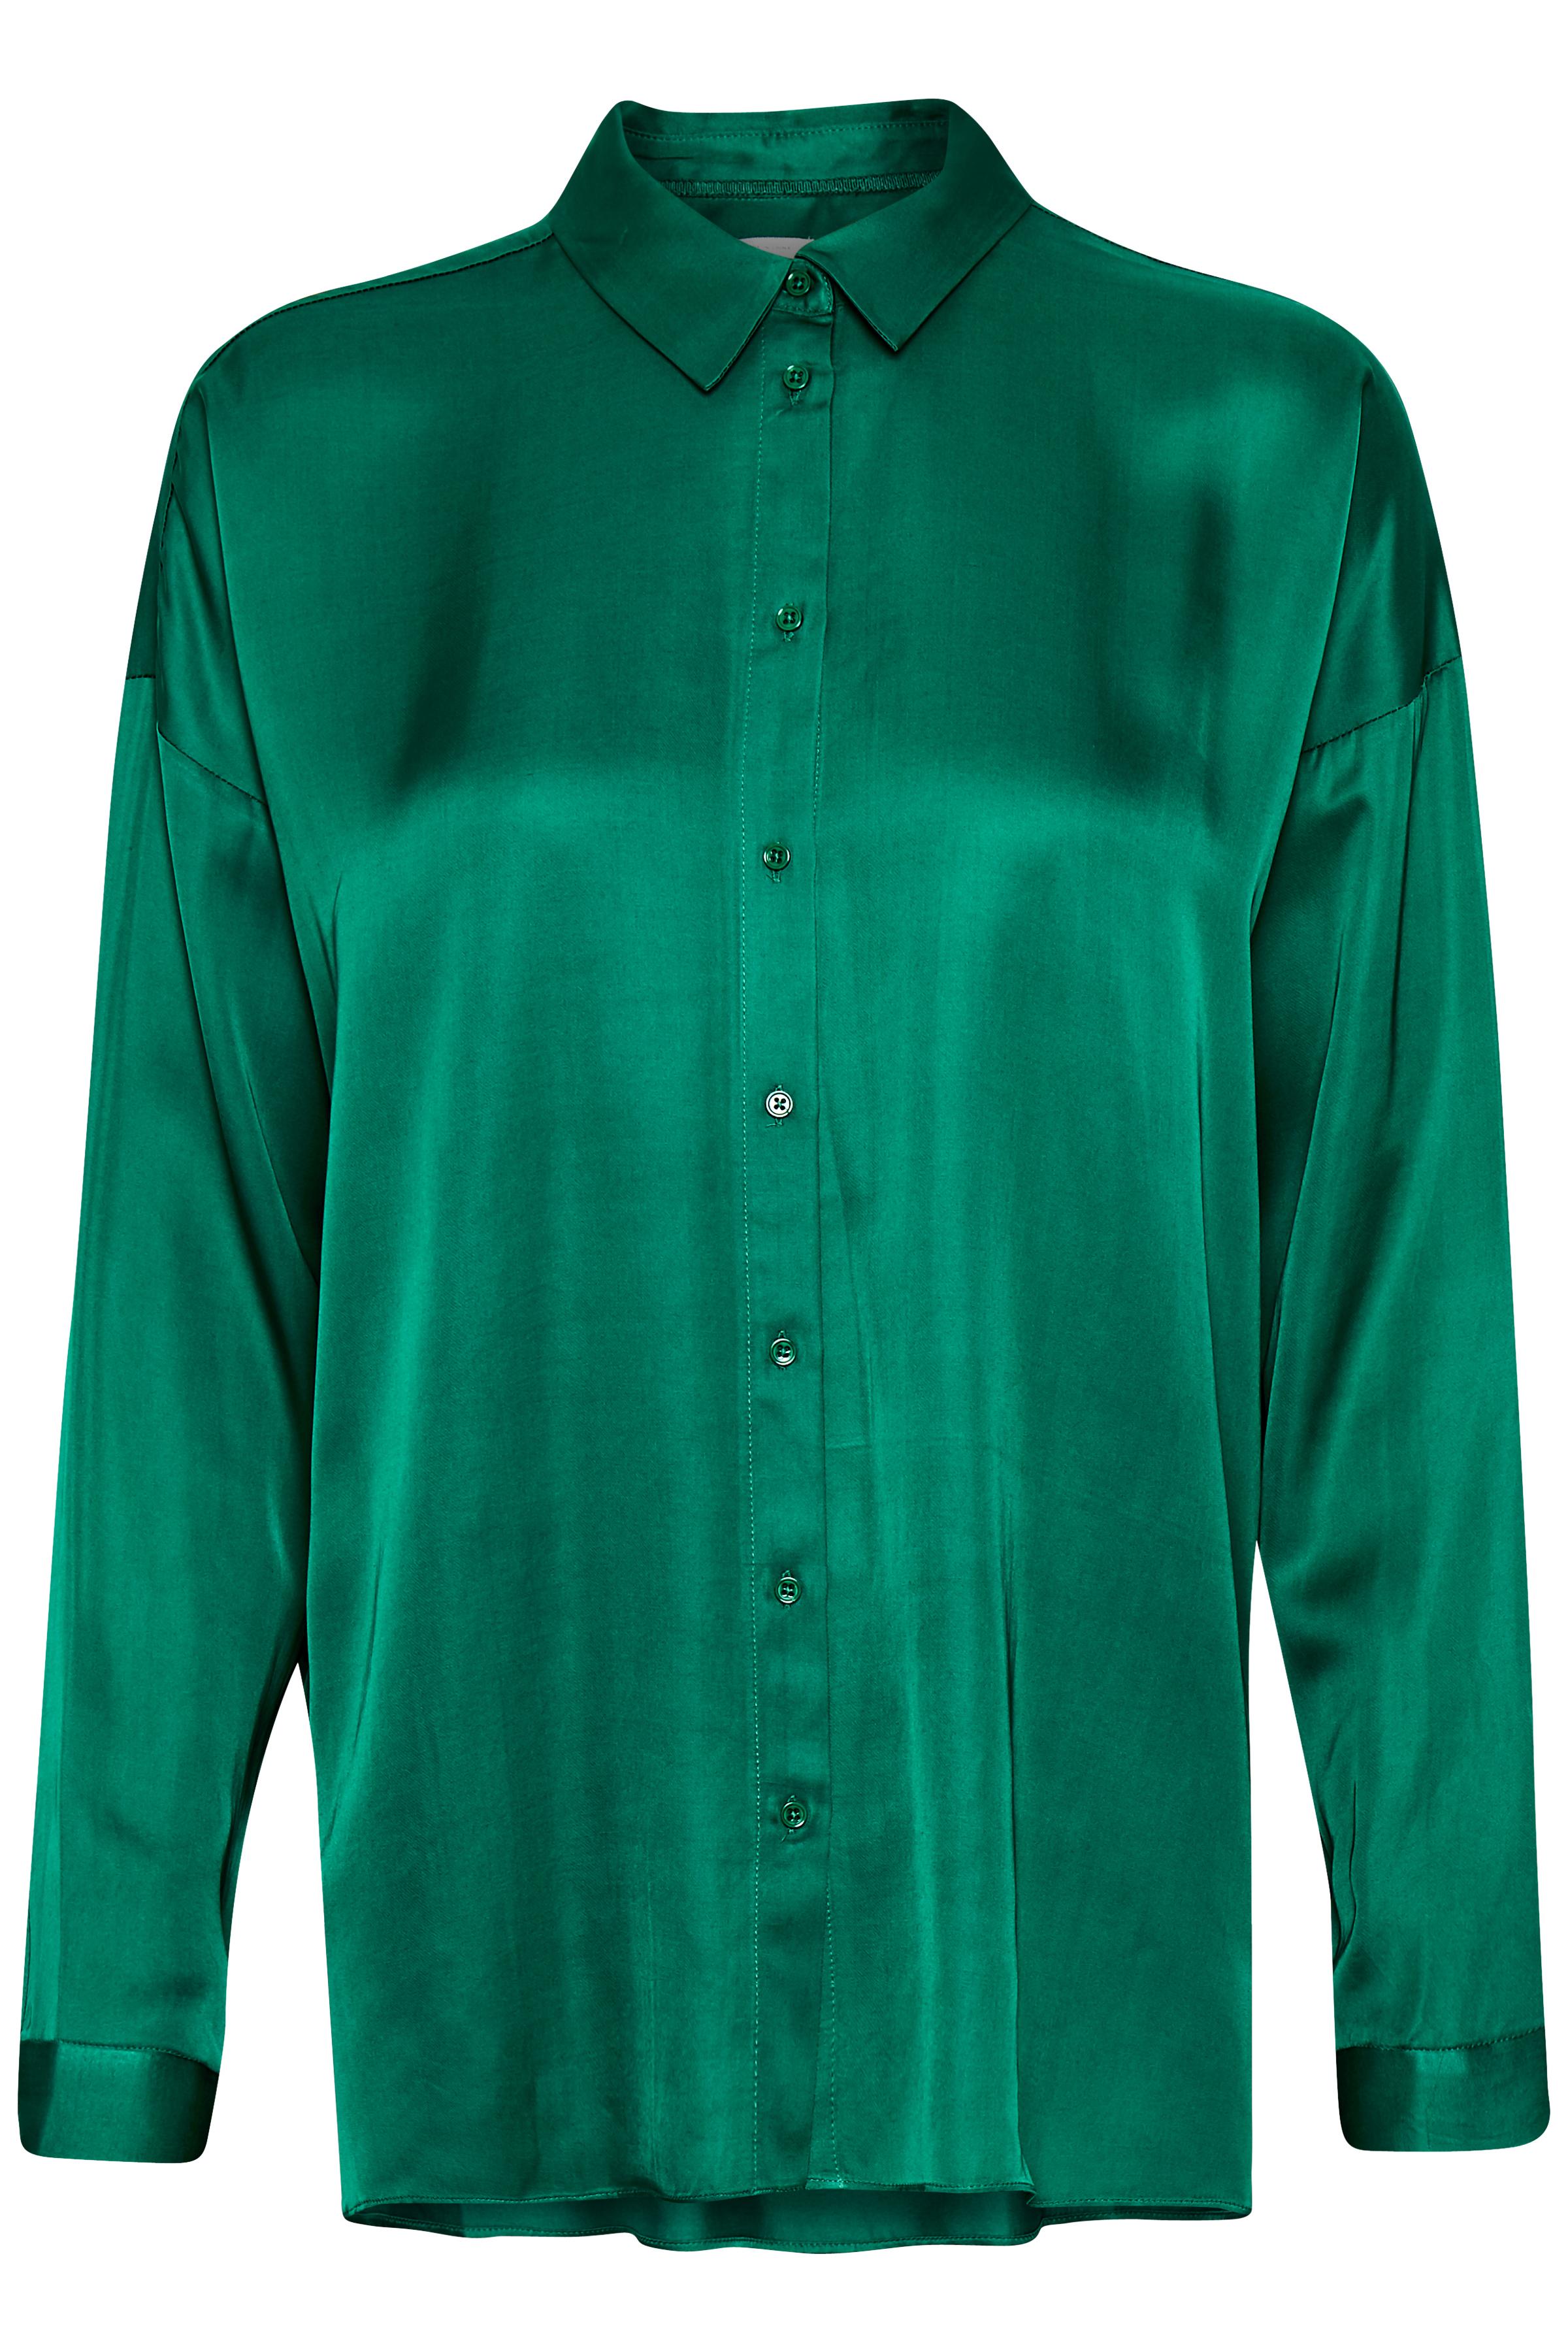 Pepper Green Langærmet skjorte – Køb Pepper Green Langærmet skjorte fra str. 32-44 her